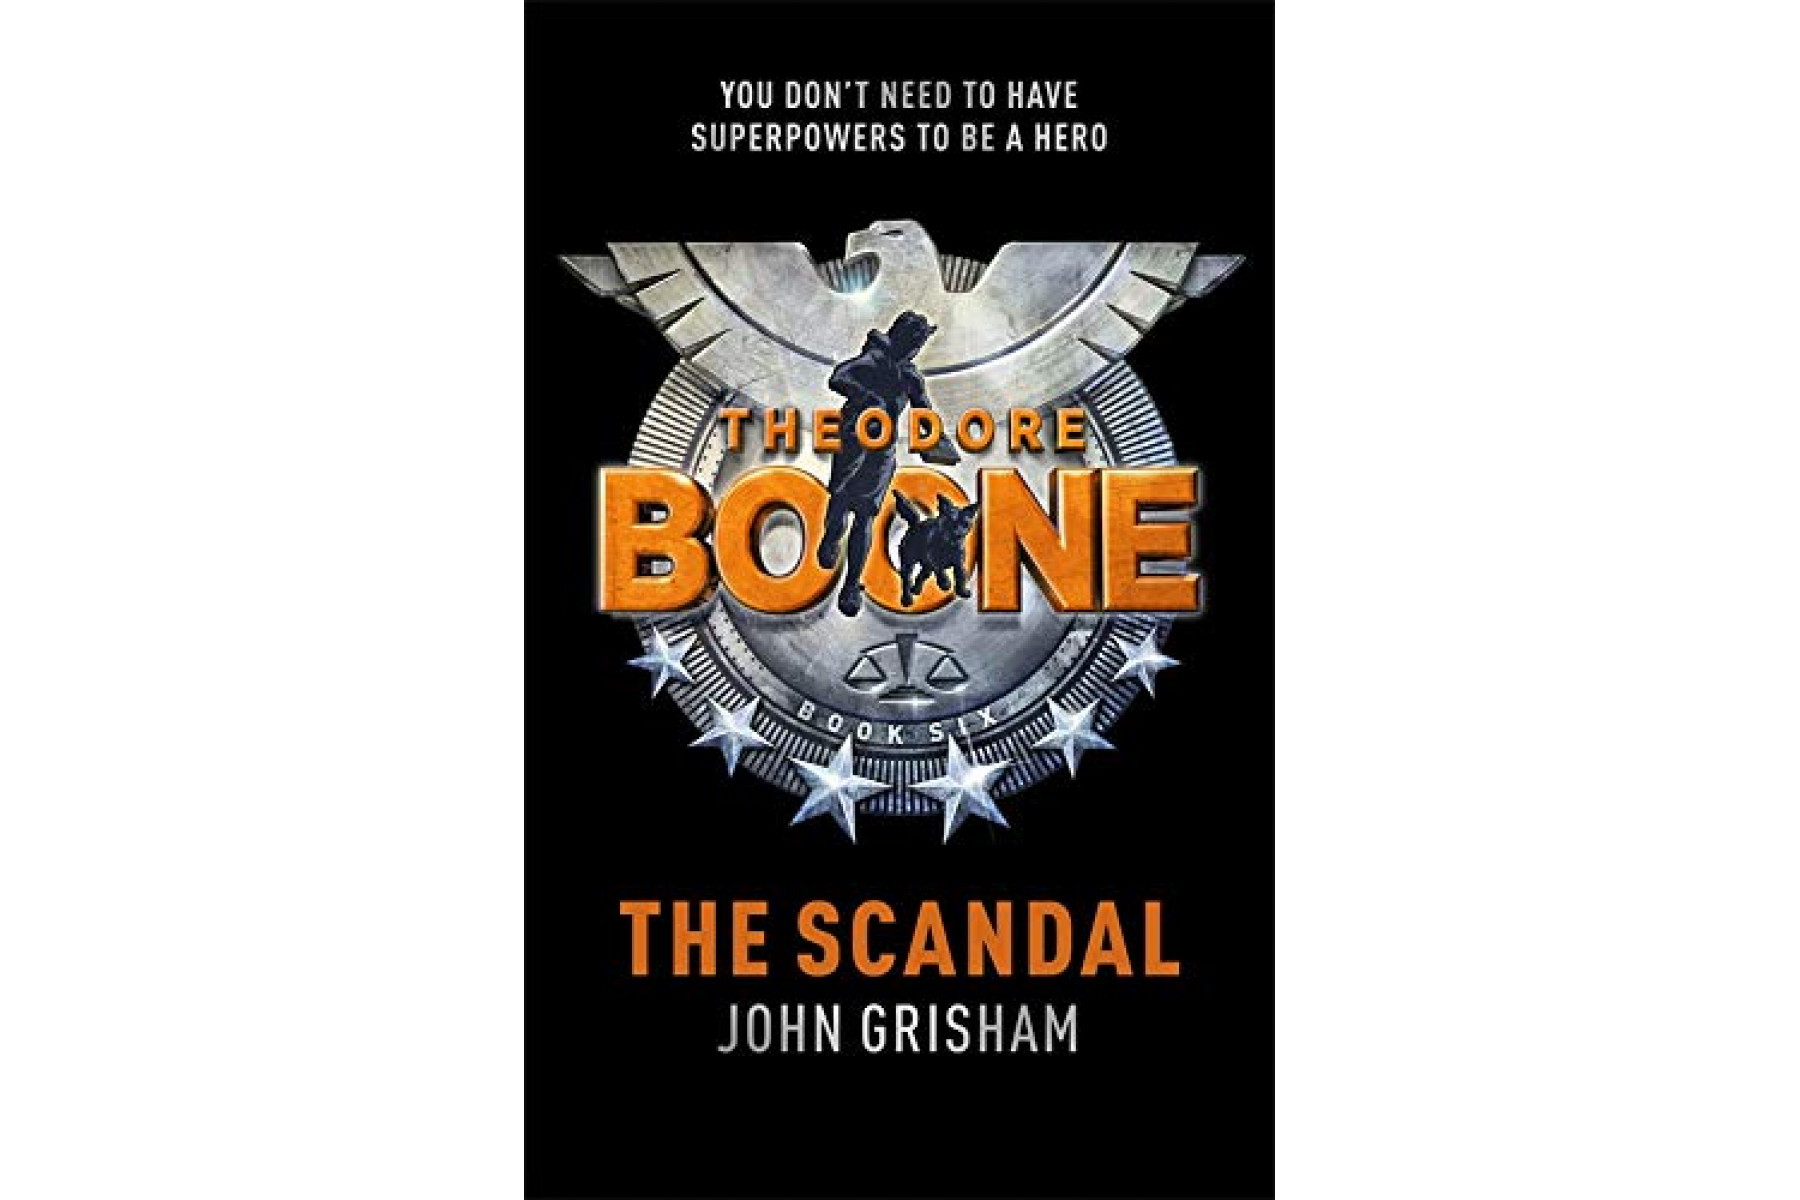 Theodore Boone: The Scandal (Book 6)